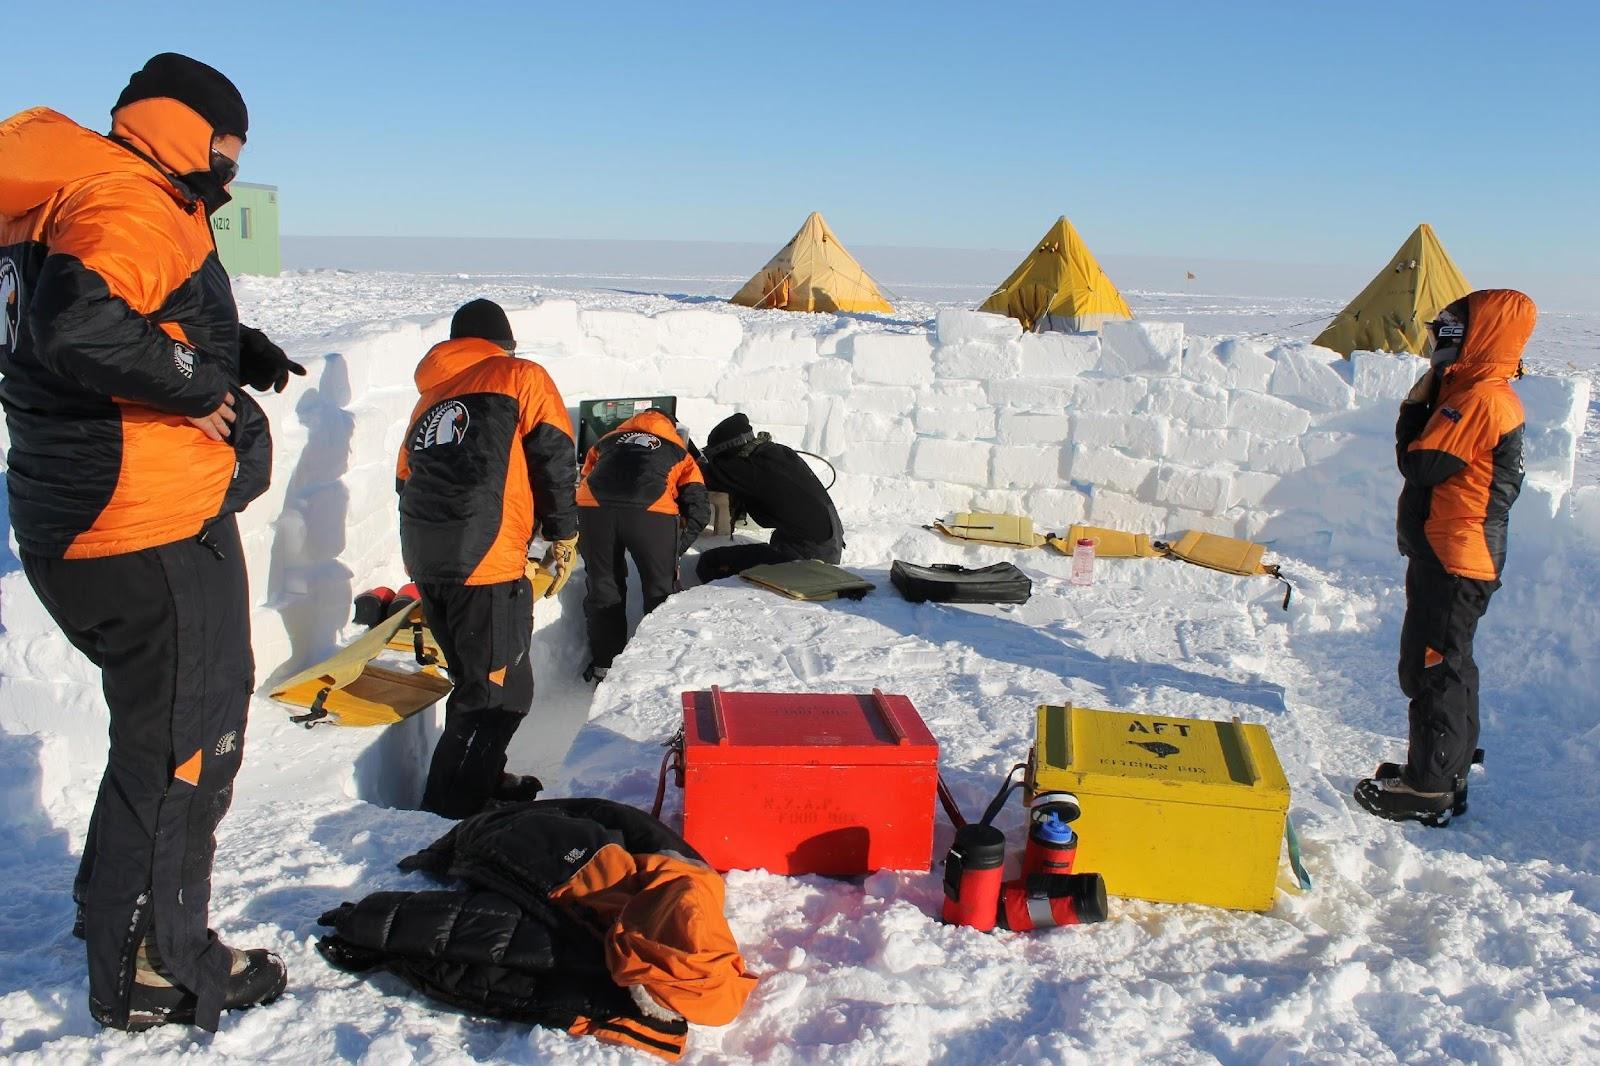 Macintosh HD:Users:Fede:Pictures:Antarctica:Antarctica 17:IMG_2587.JPG